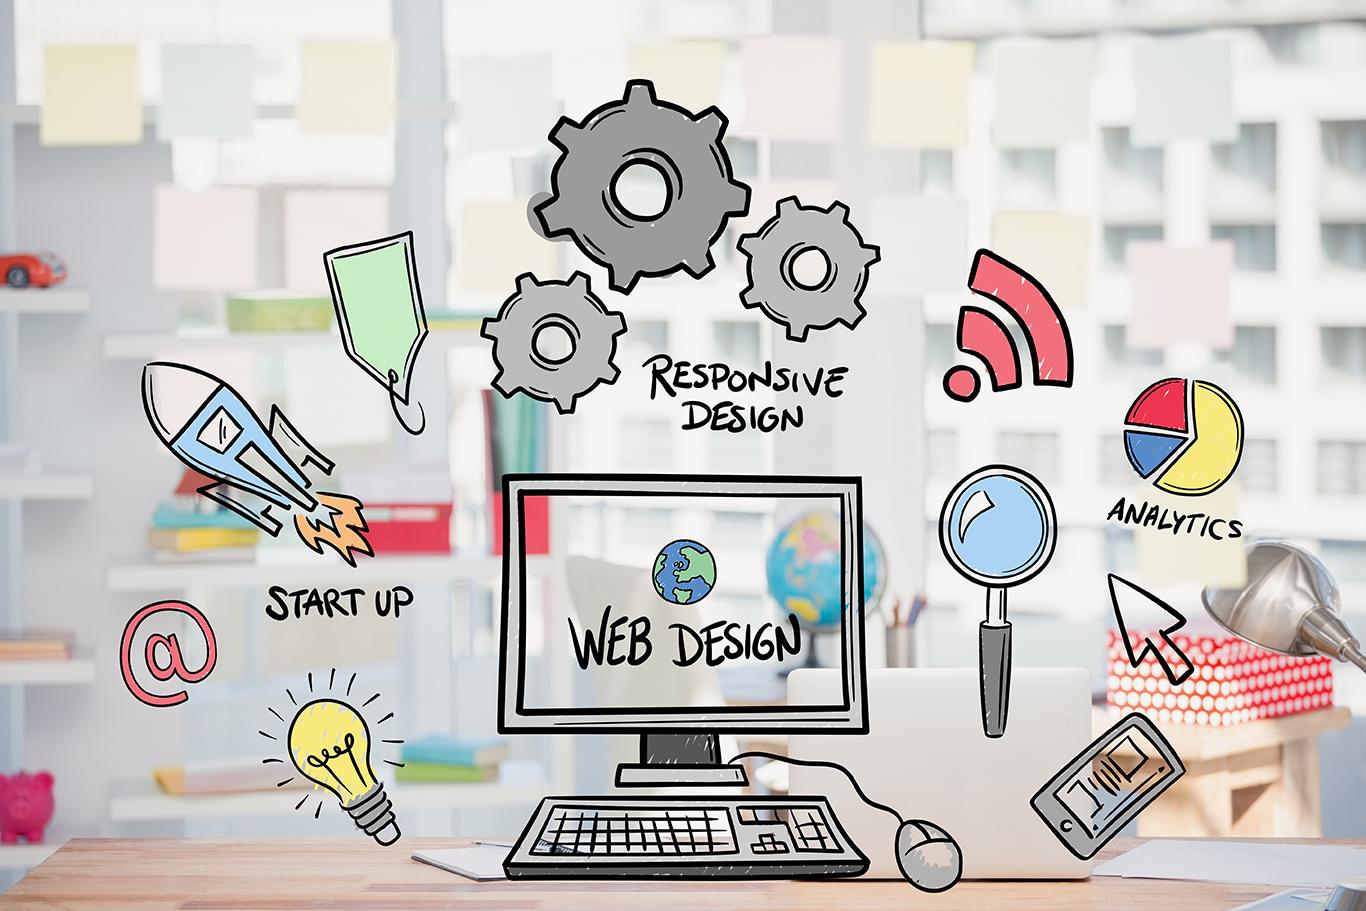 Best Web Design Company - Semidot Infotech